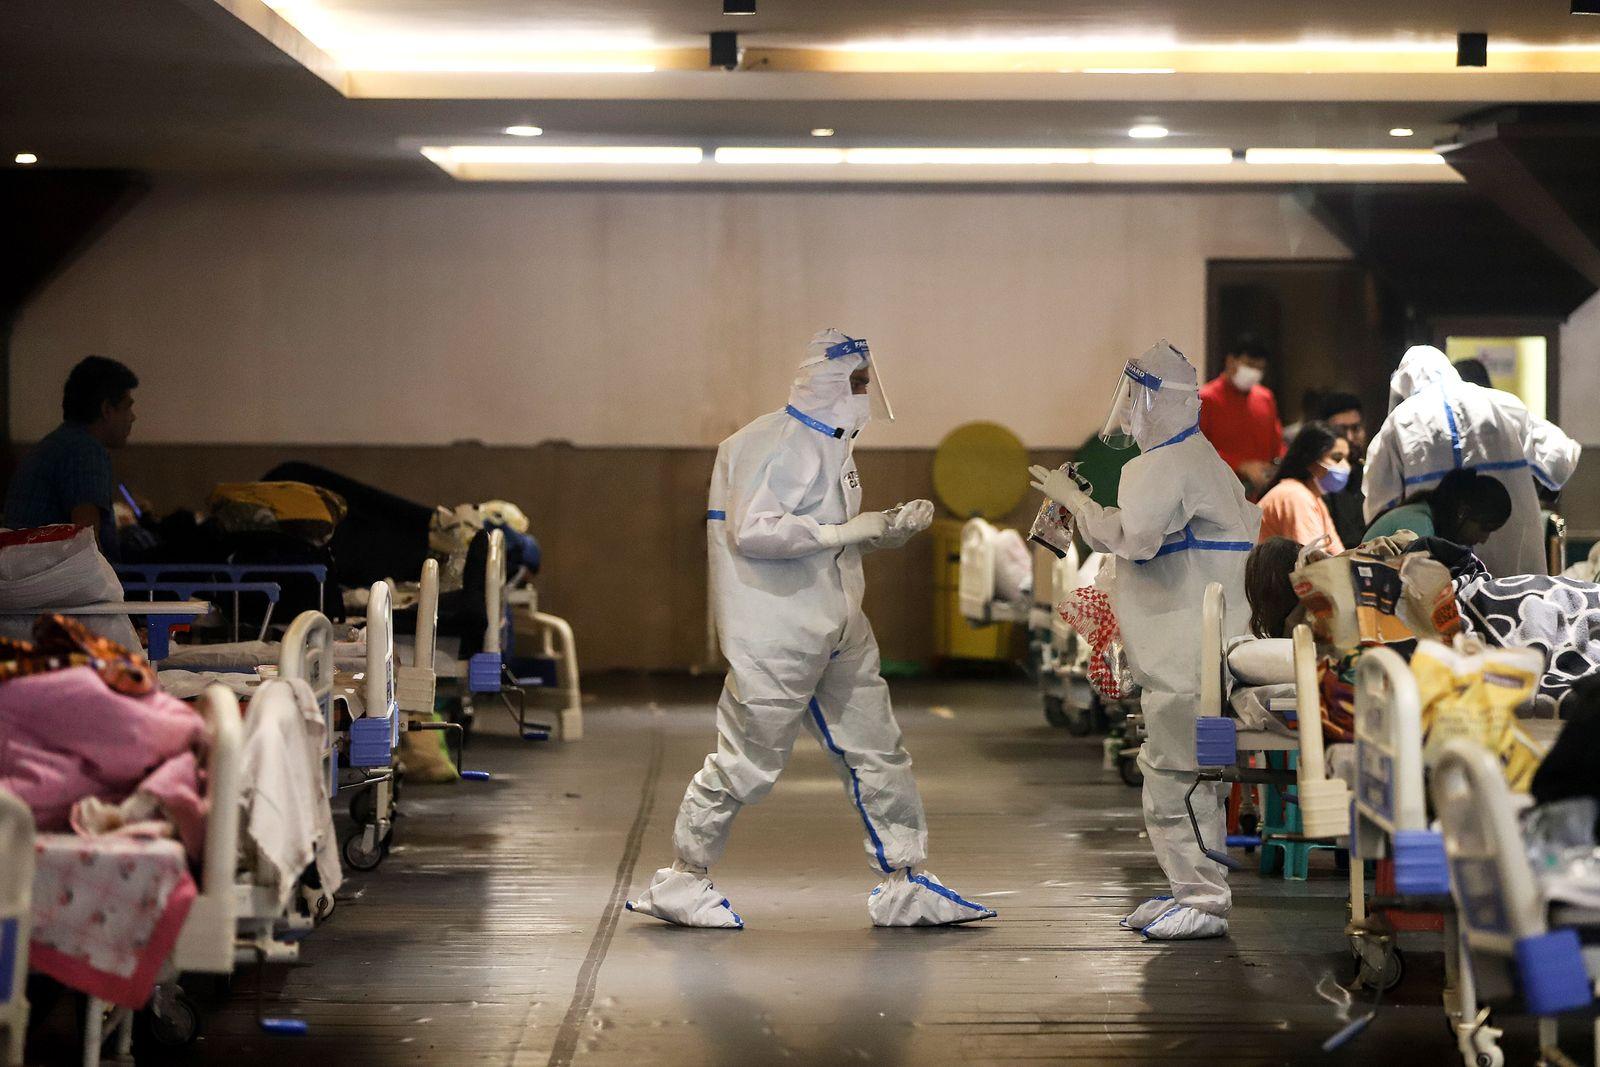 India logs world's highest number of coronavirus cases